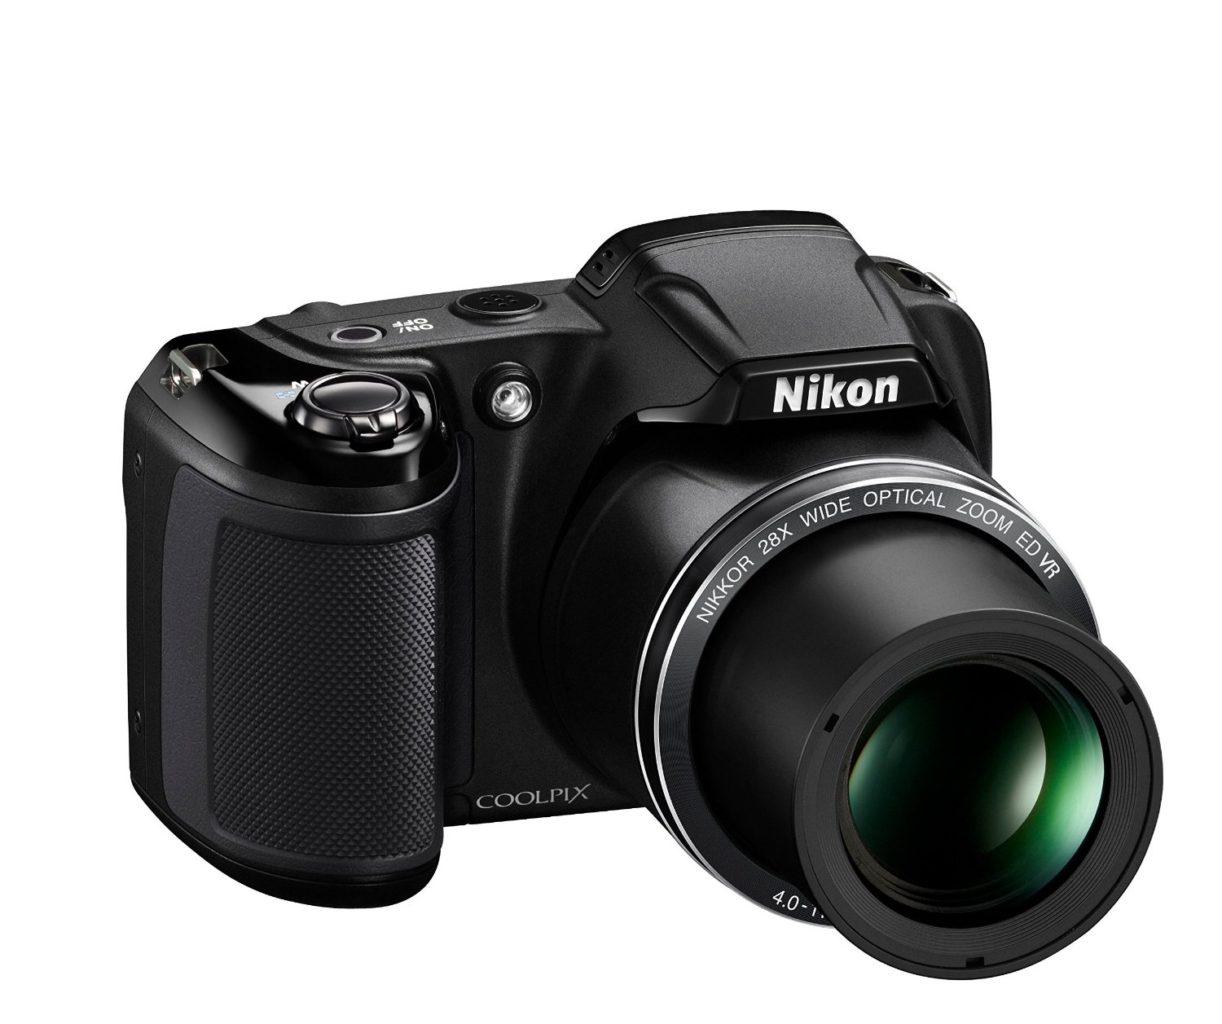 Nikon Coolpix L340 Cyber Monday & black friday 2017Deals